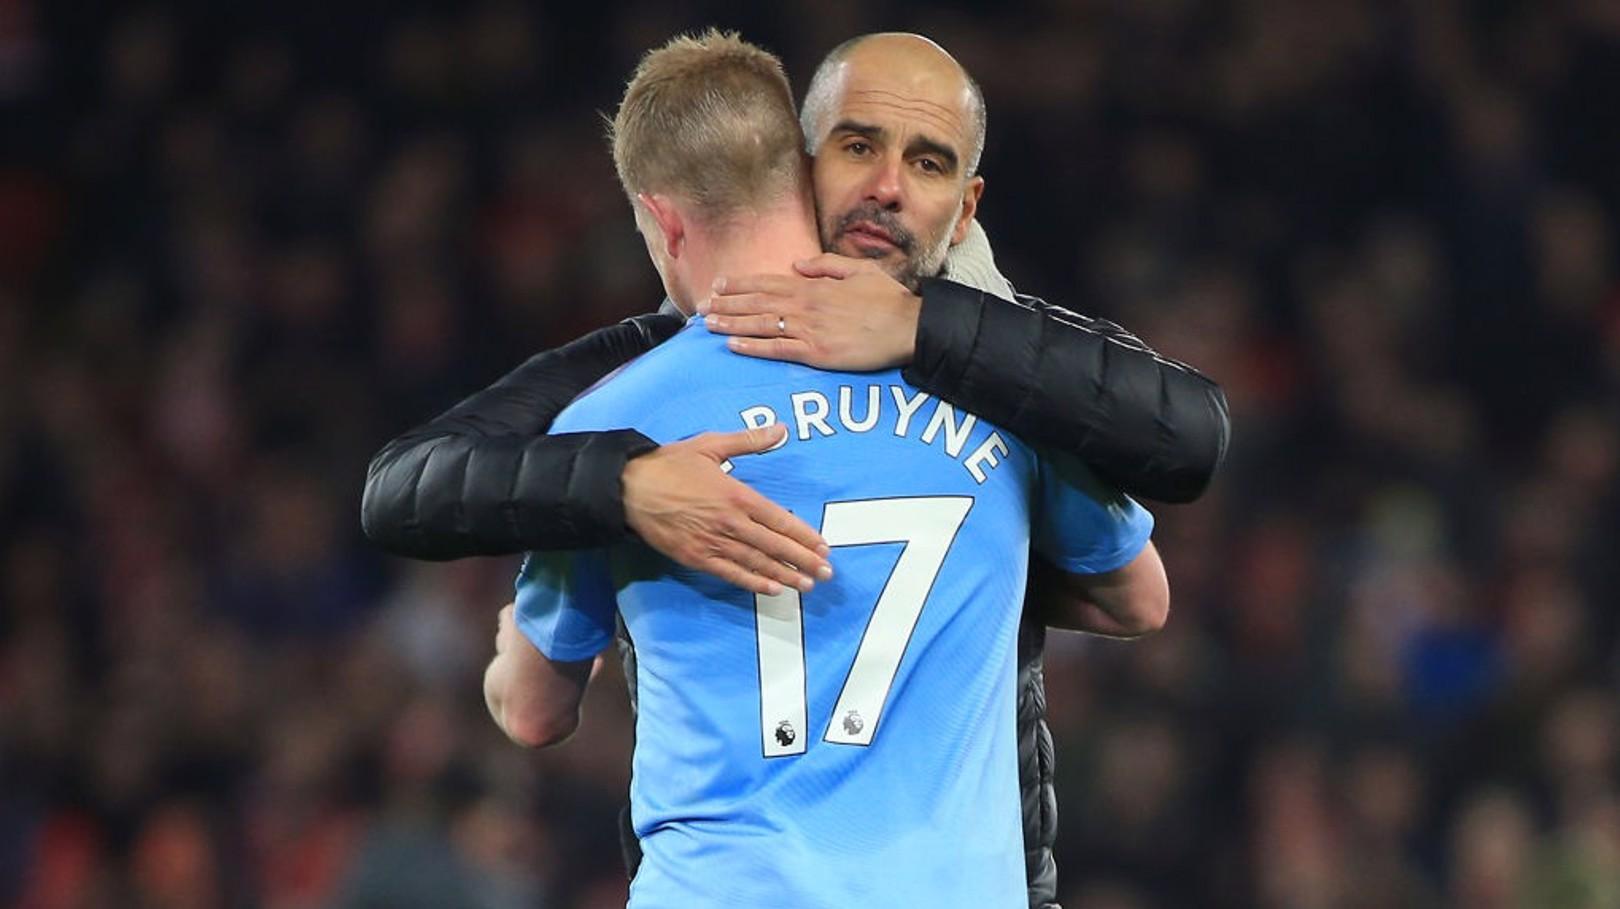 'De Bruyne world's best' says Pep